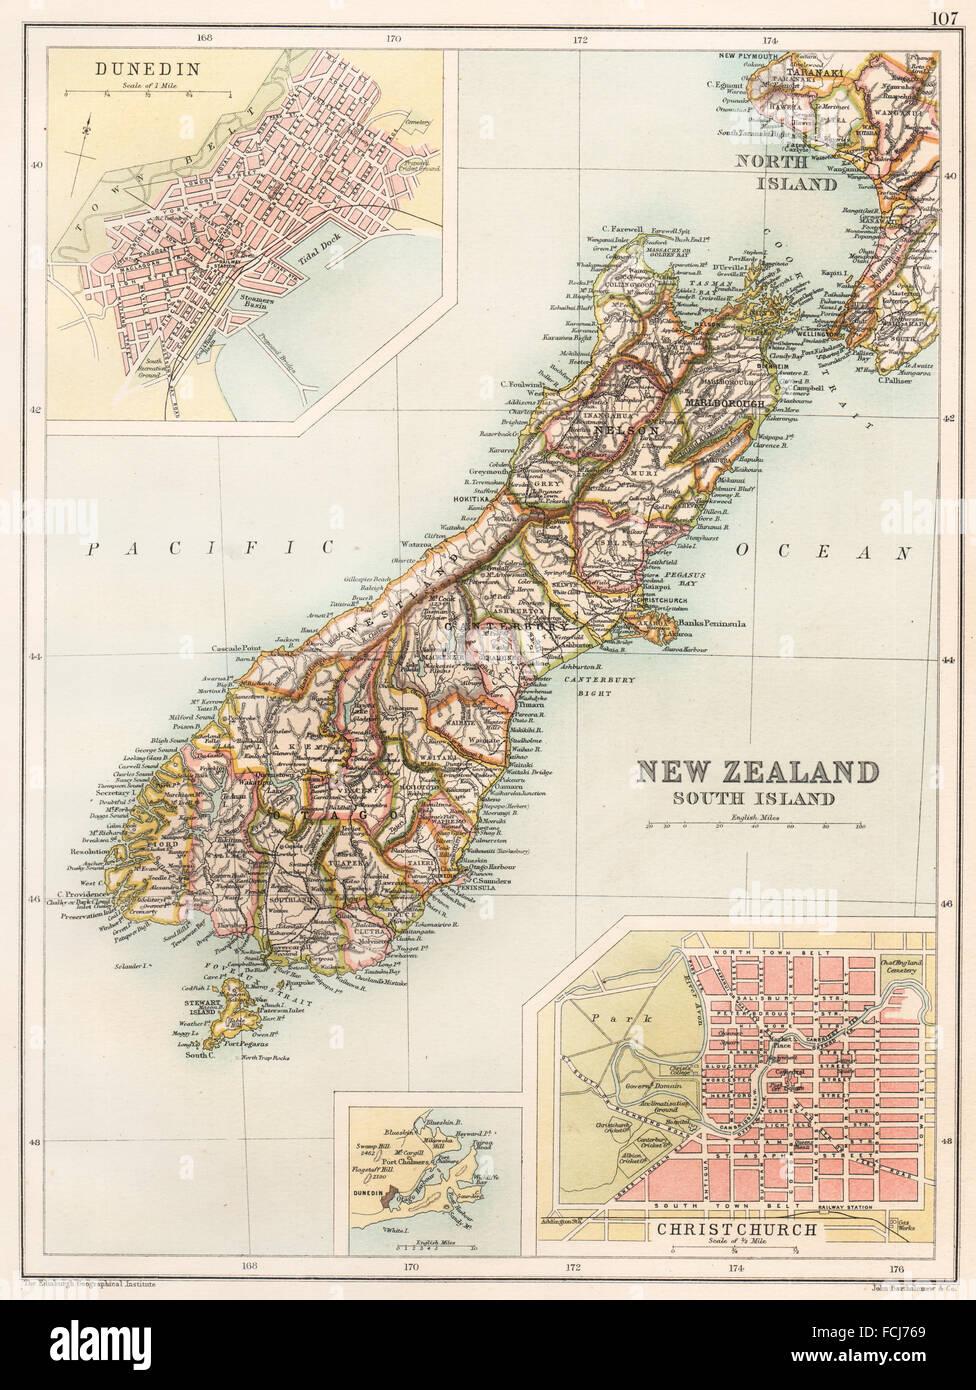 Karte Neuseeland Südinsel Zum Ausdrucken.New Zealand South Island Map Stockfotos New Zealand South Island